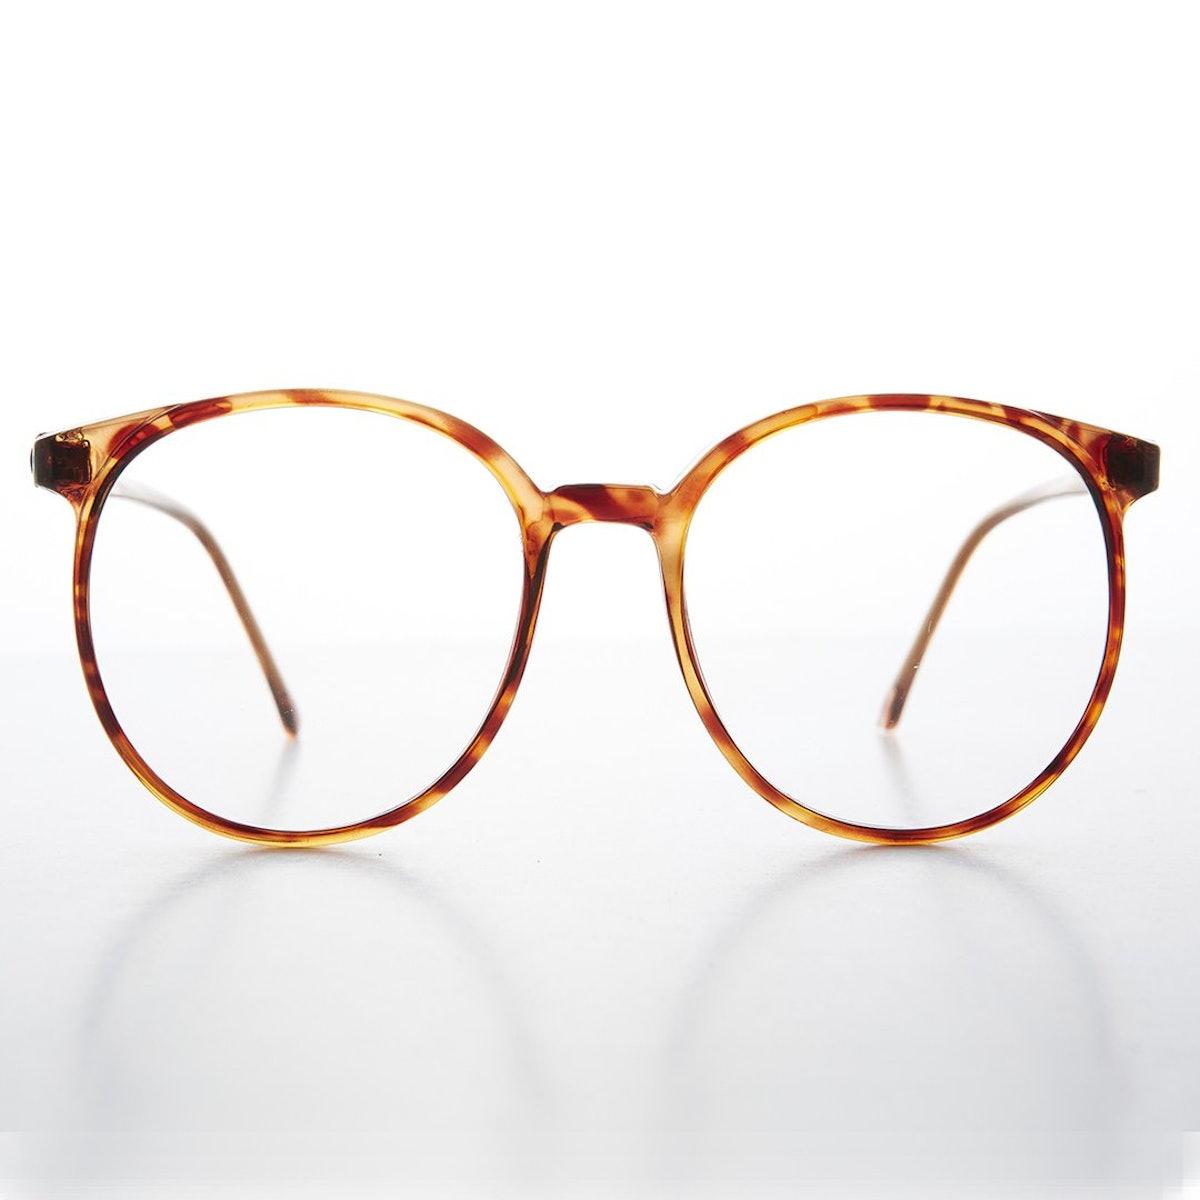 Big '80s Secretary Eyeglasses With Clear Lens